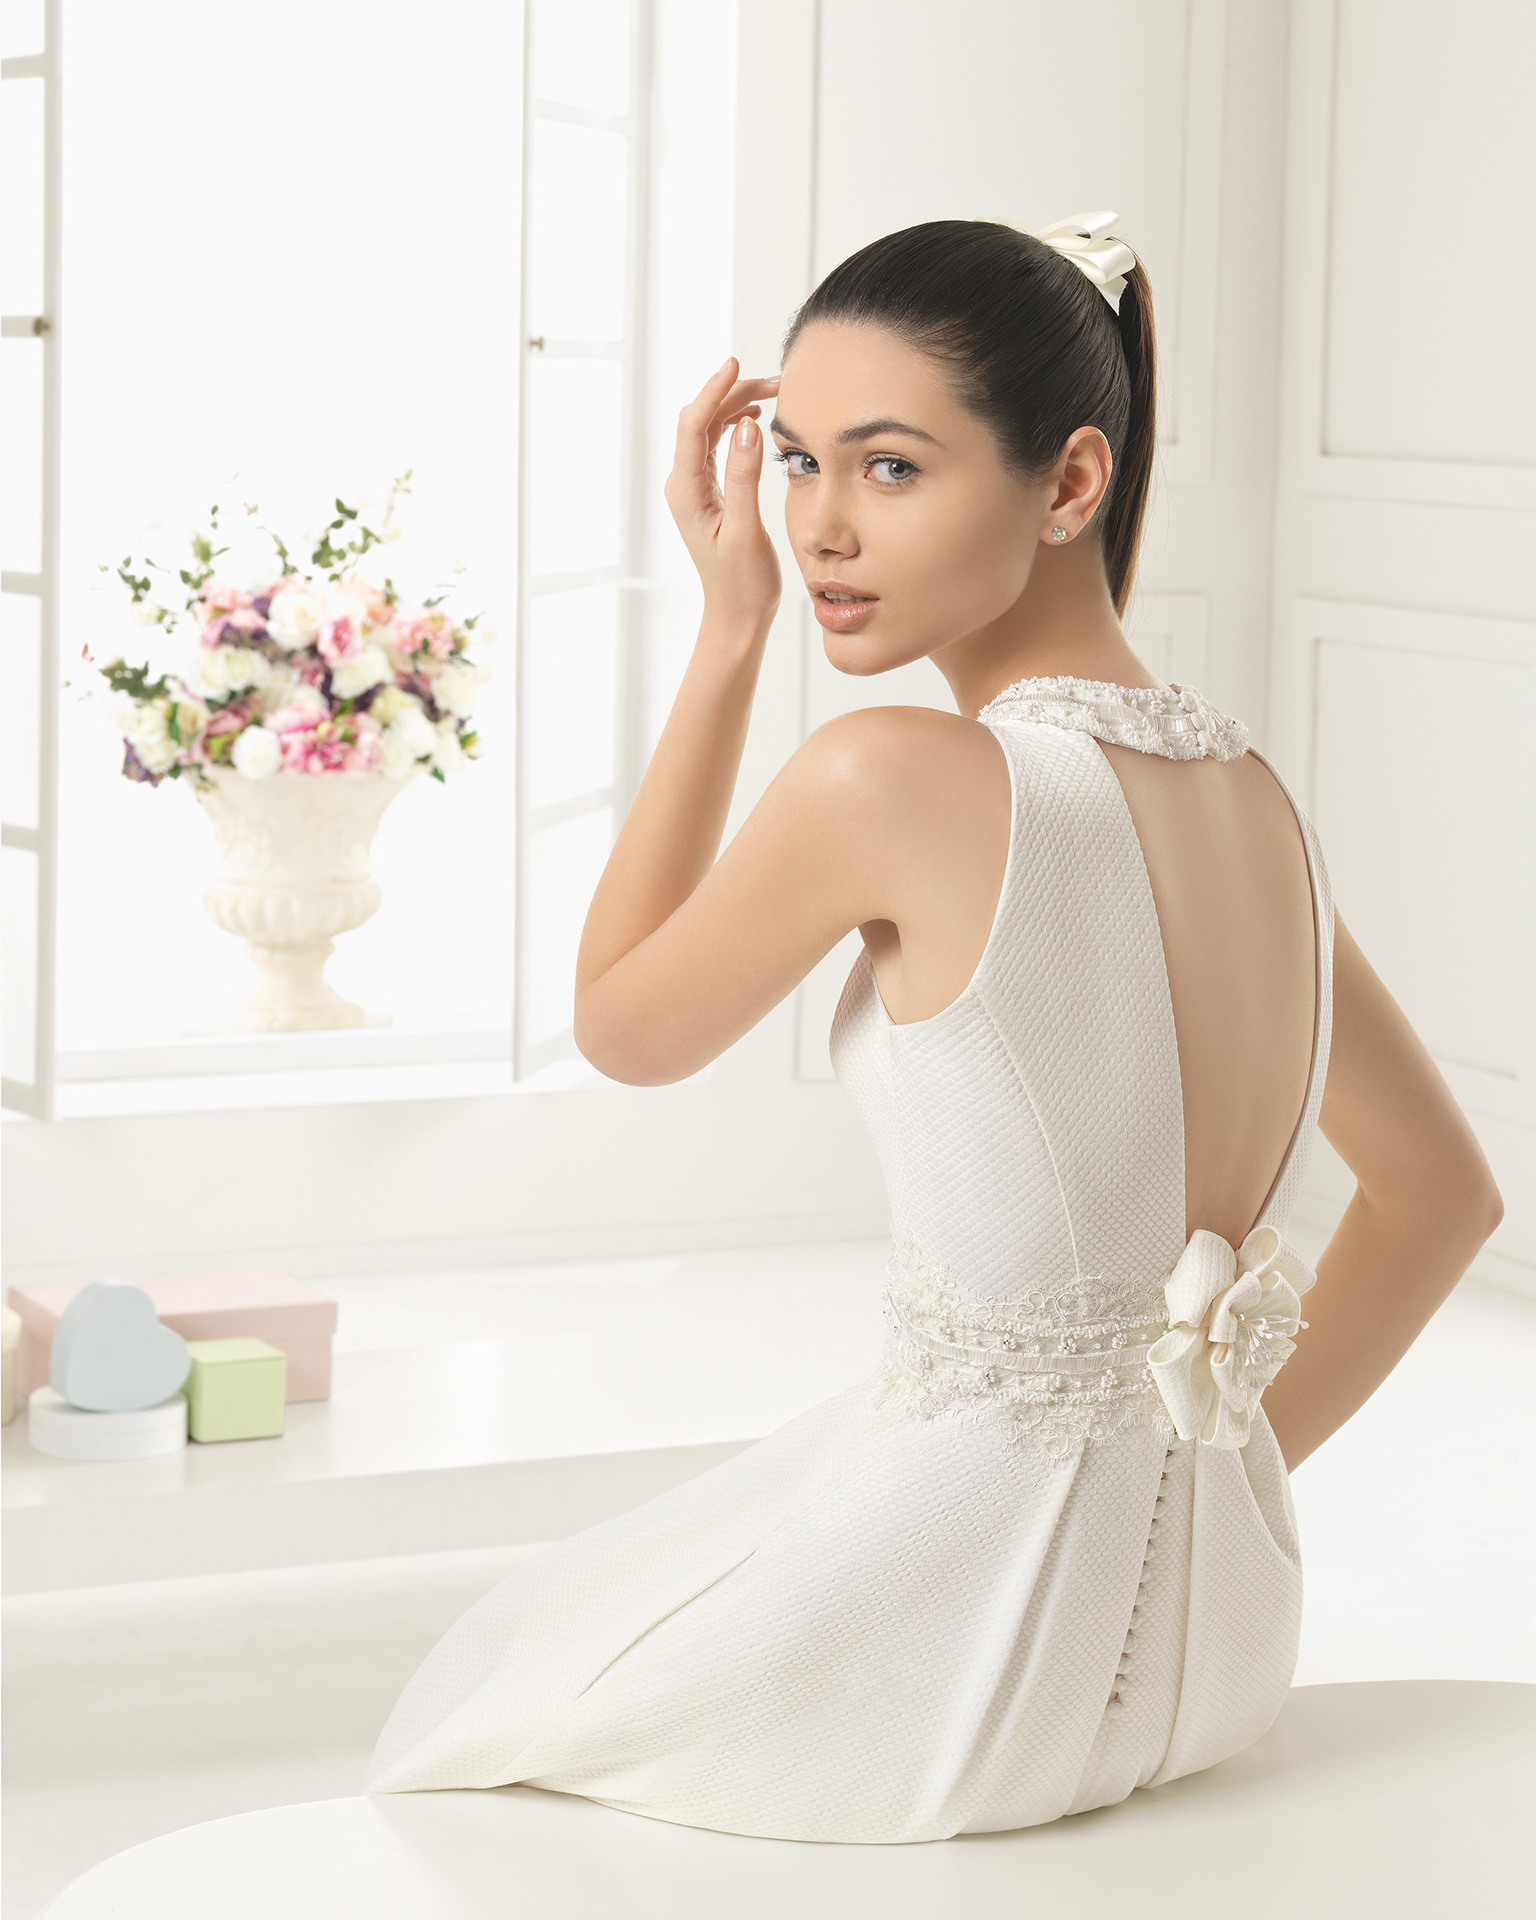 Elton (38, микадо/кружево/бисер, natural) Свадебное платье Rosa Clara в Одессе. Свадебный салон Скоро Свадьба.